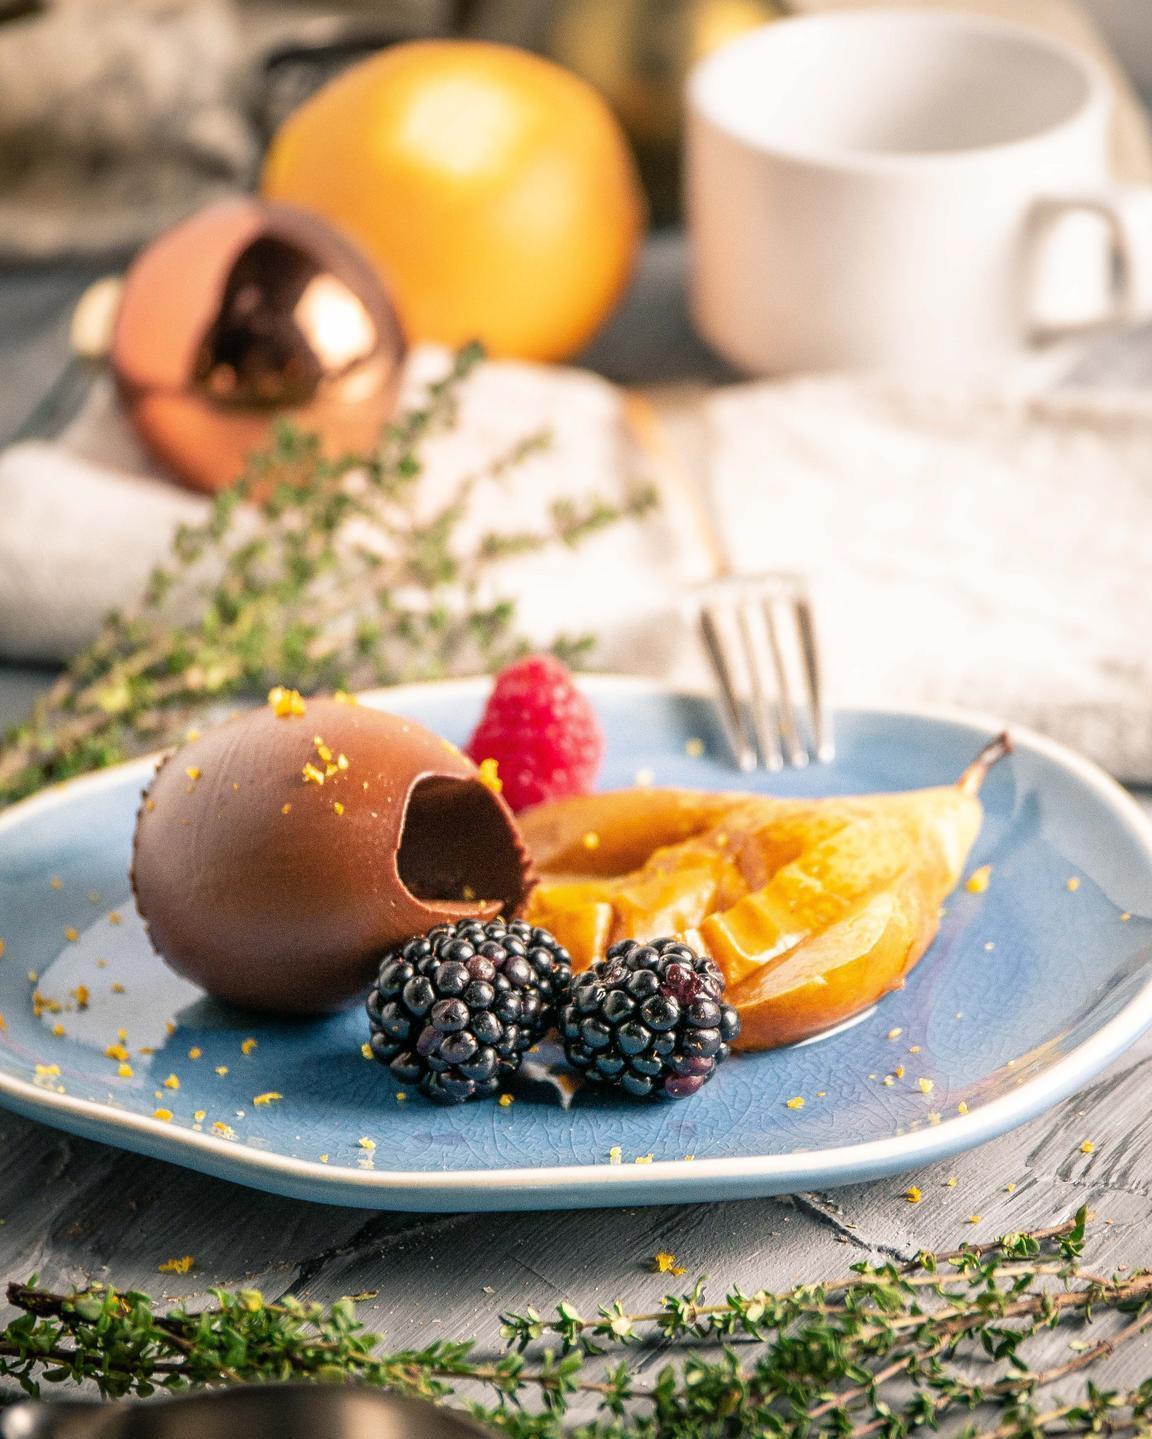 vegan dessert made on a free veecoco online vegan cooking courses